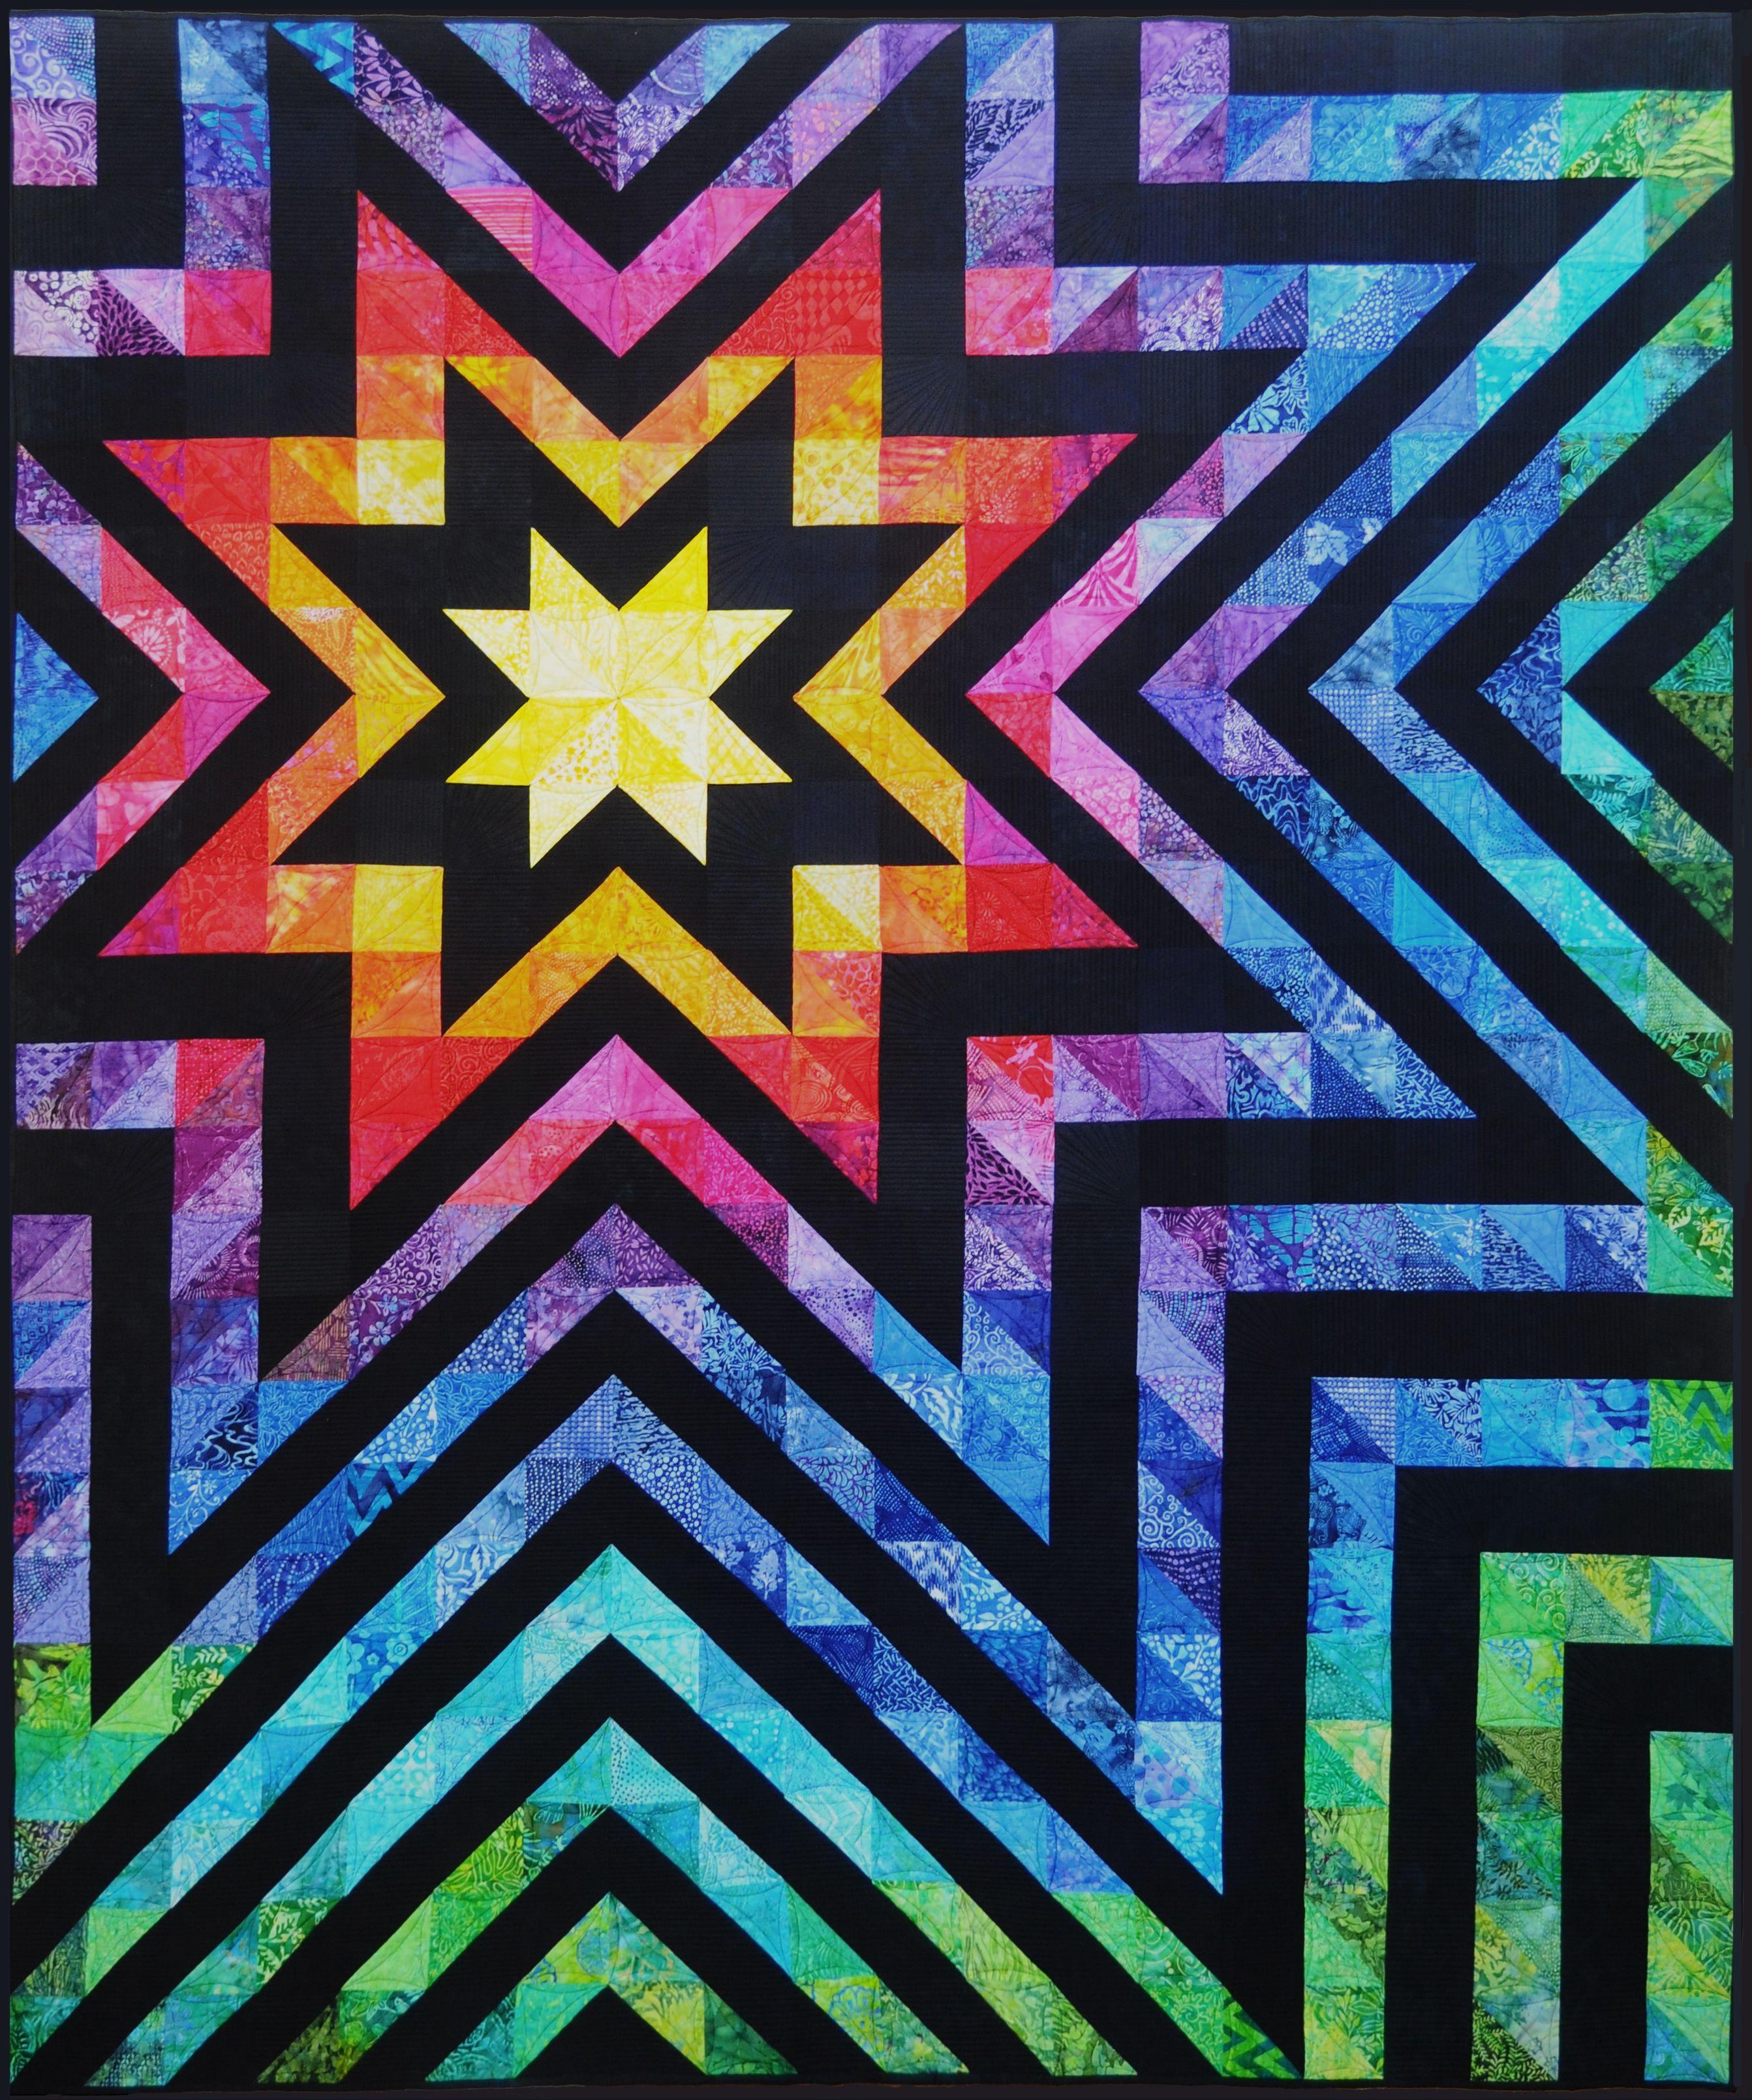 Evening star quilt guild